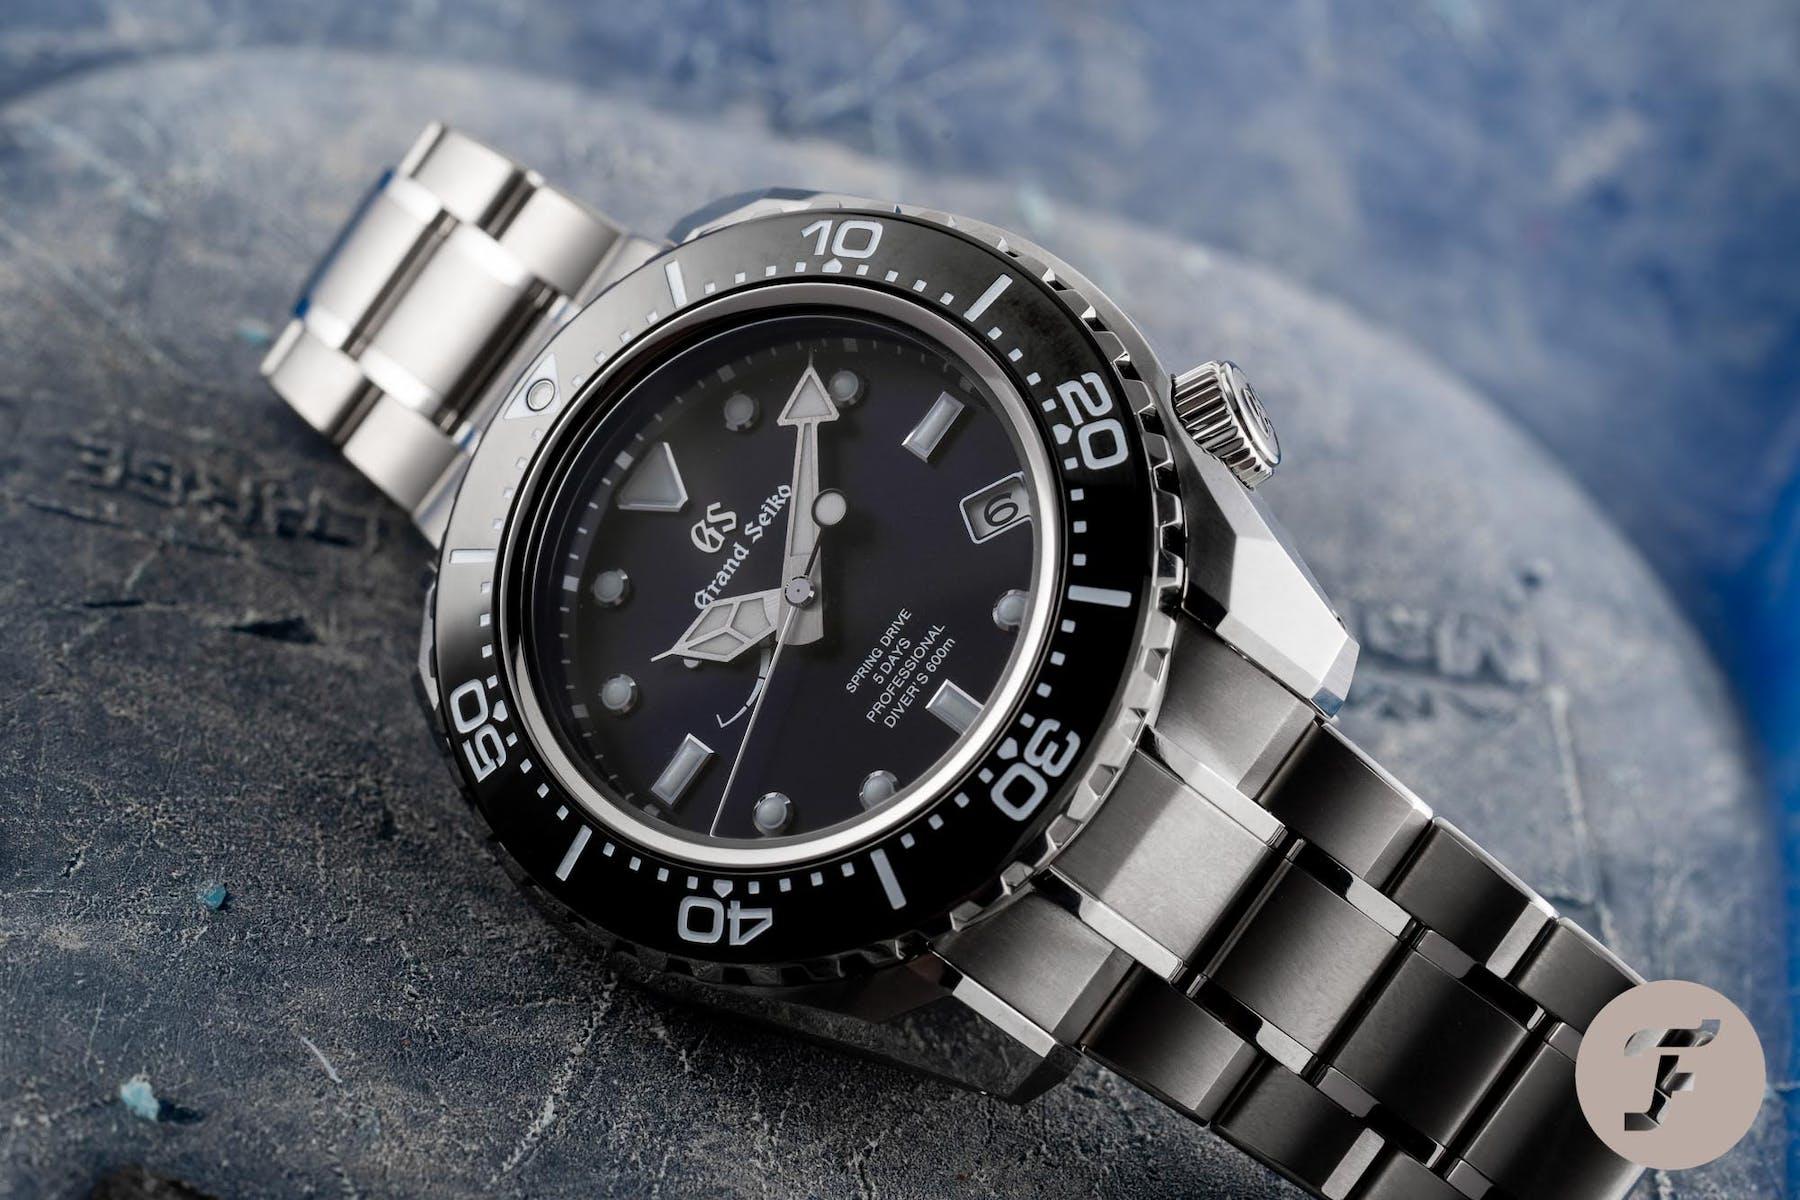 Grand Seiko Professional 600M Diver's Watch, SLGA001